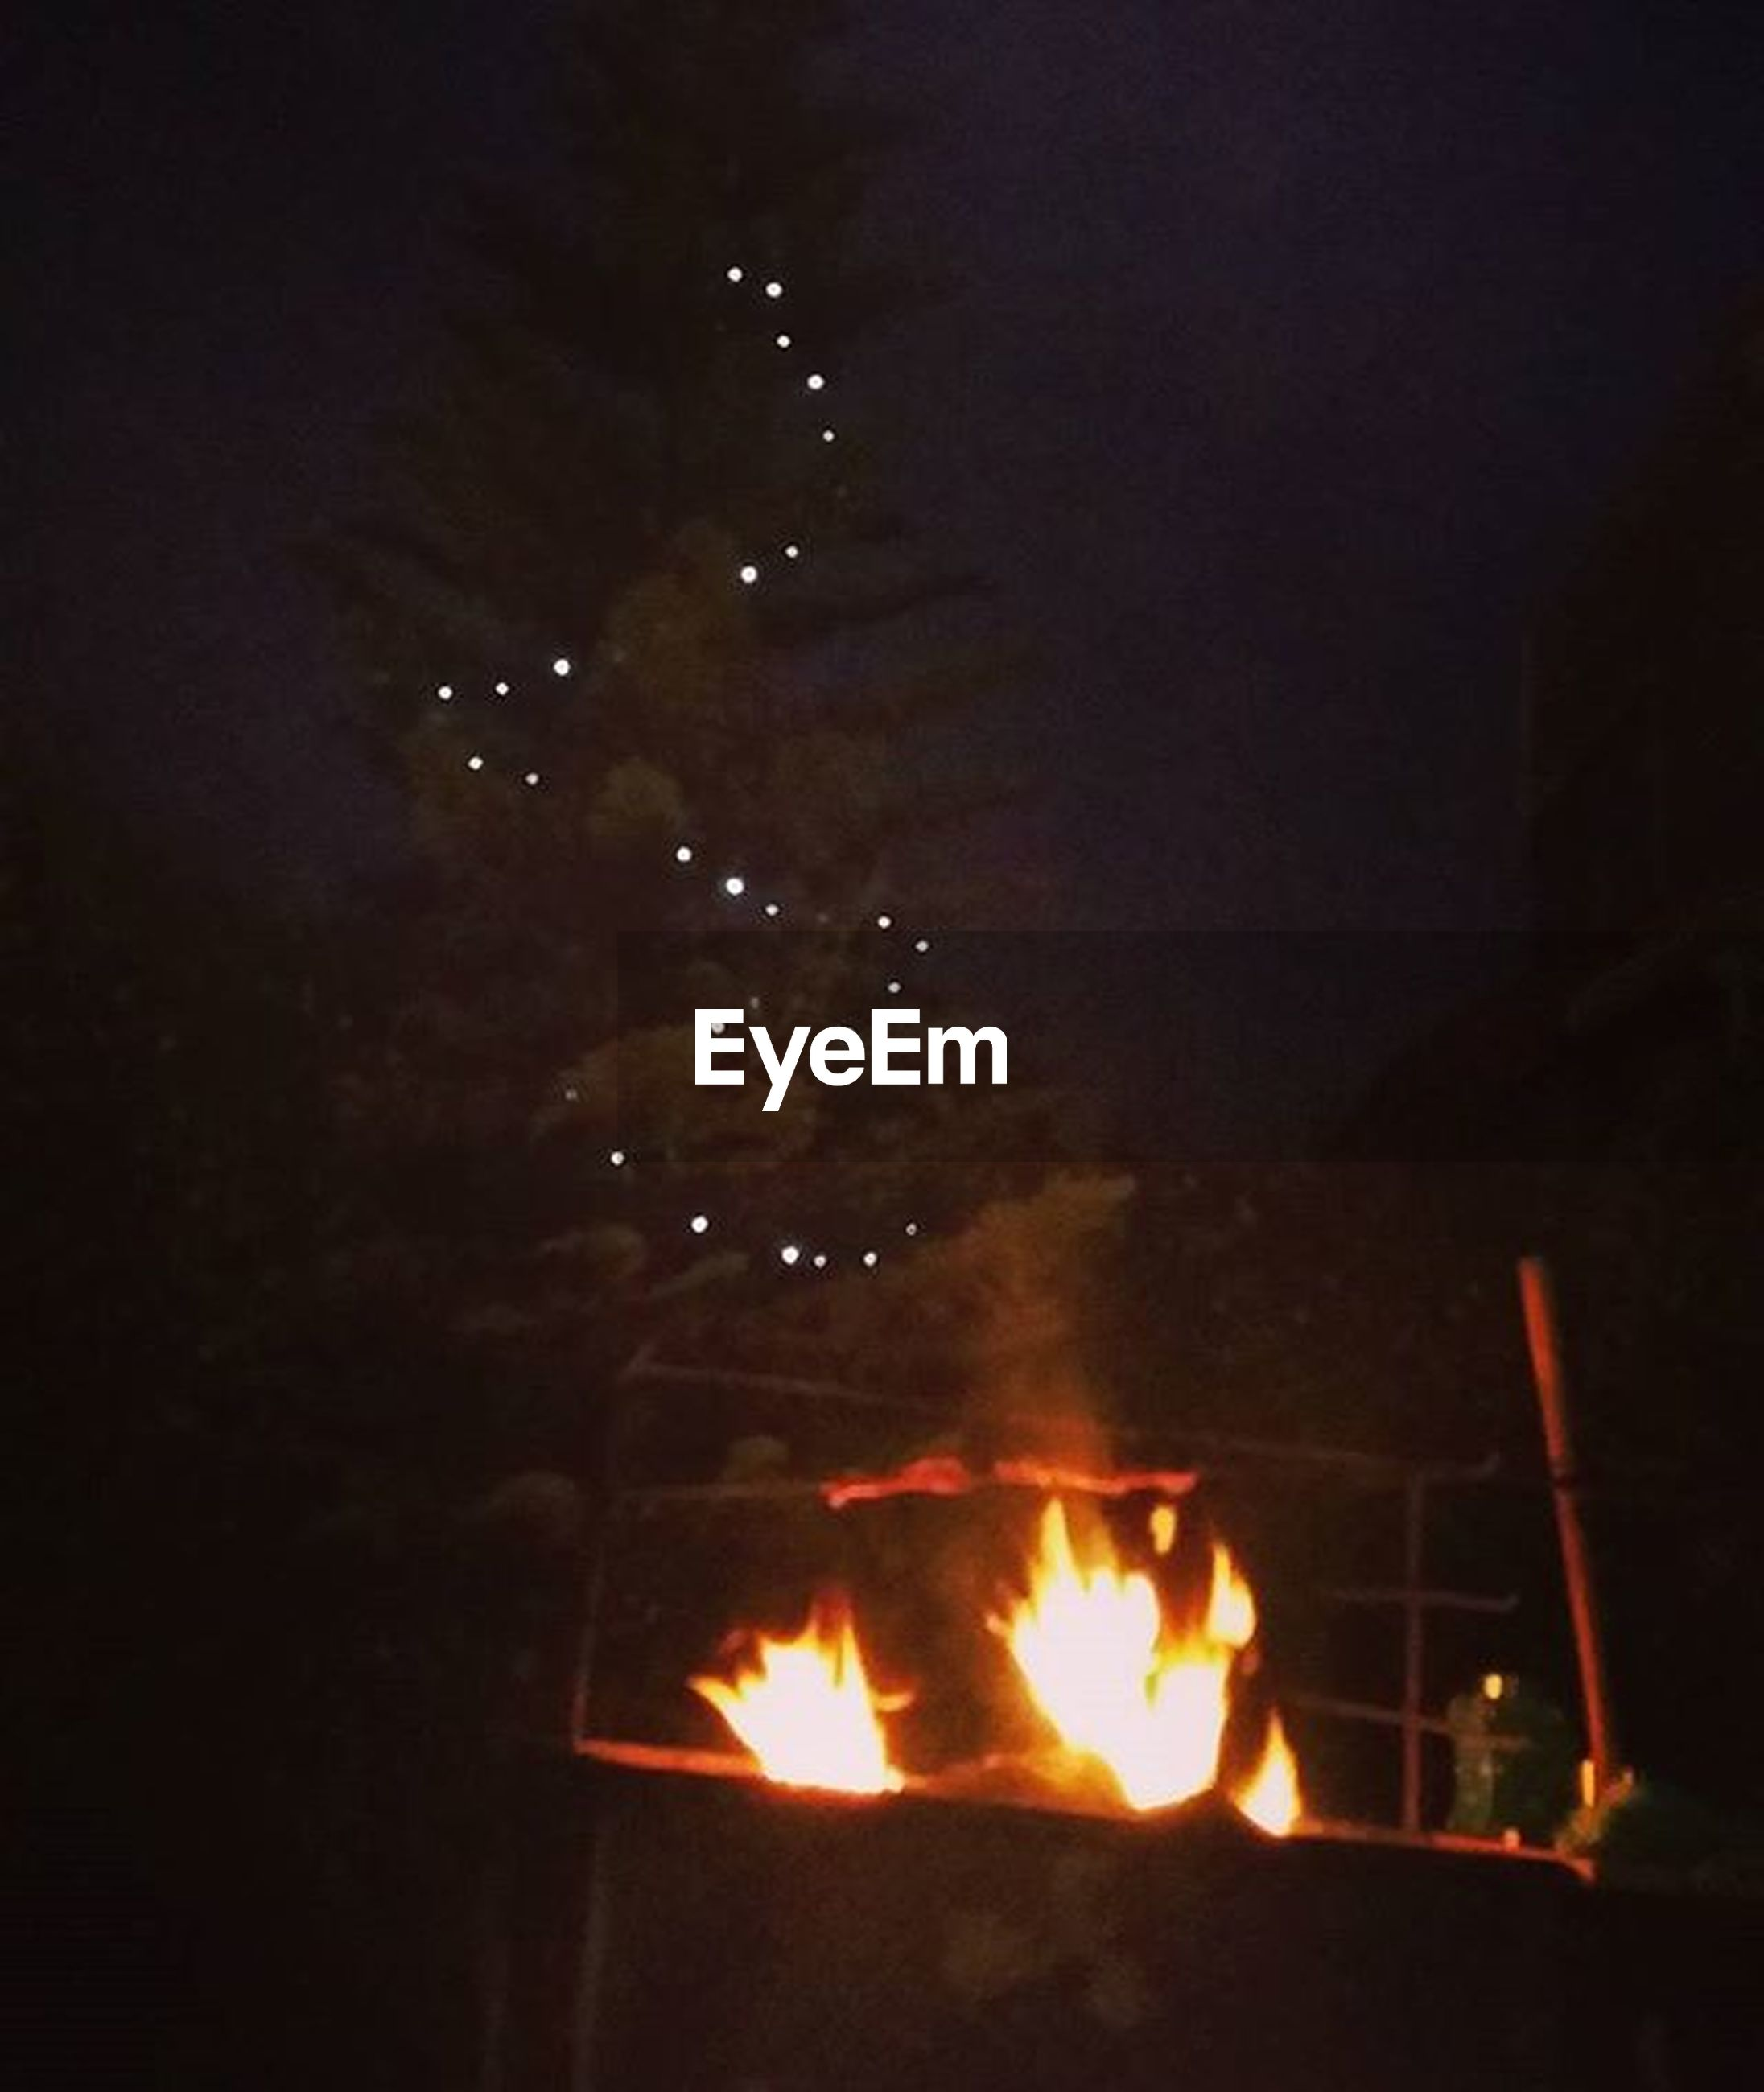 burning, fire - natural phenomenon, flame, heat - temperature, night, illuminated, glowing, bonfire, fire, heat, firewood, dark, campfire, light - natural phenomenon, motion, fireplace, smoke - physical structure, outdoors, no people